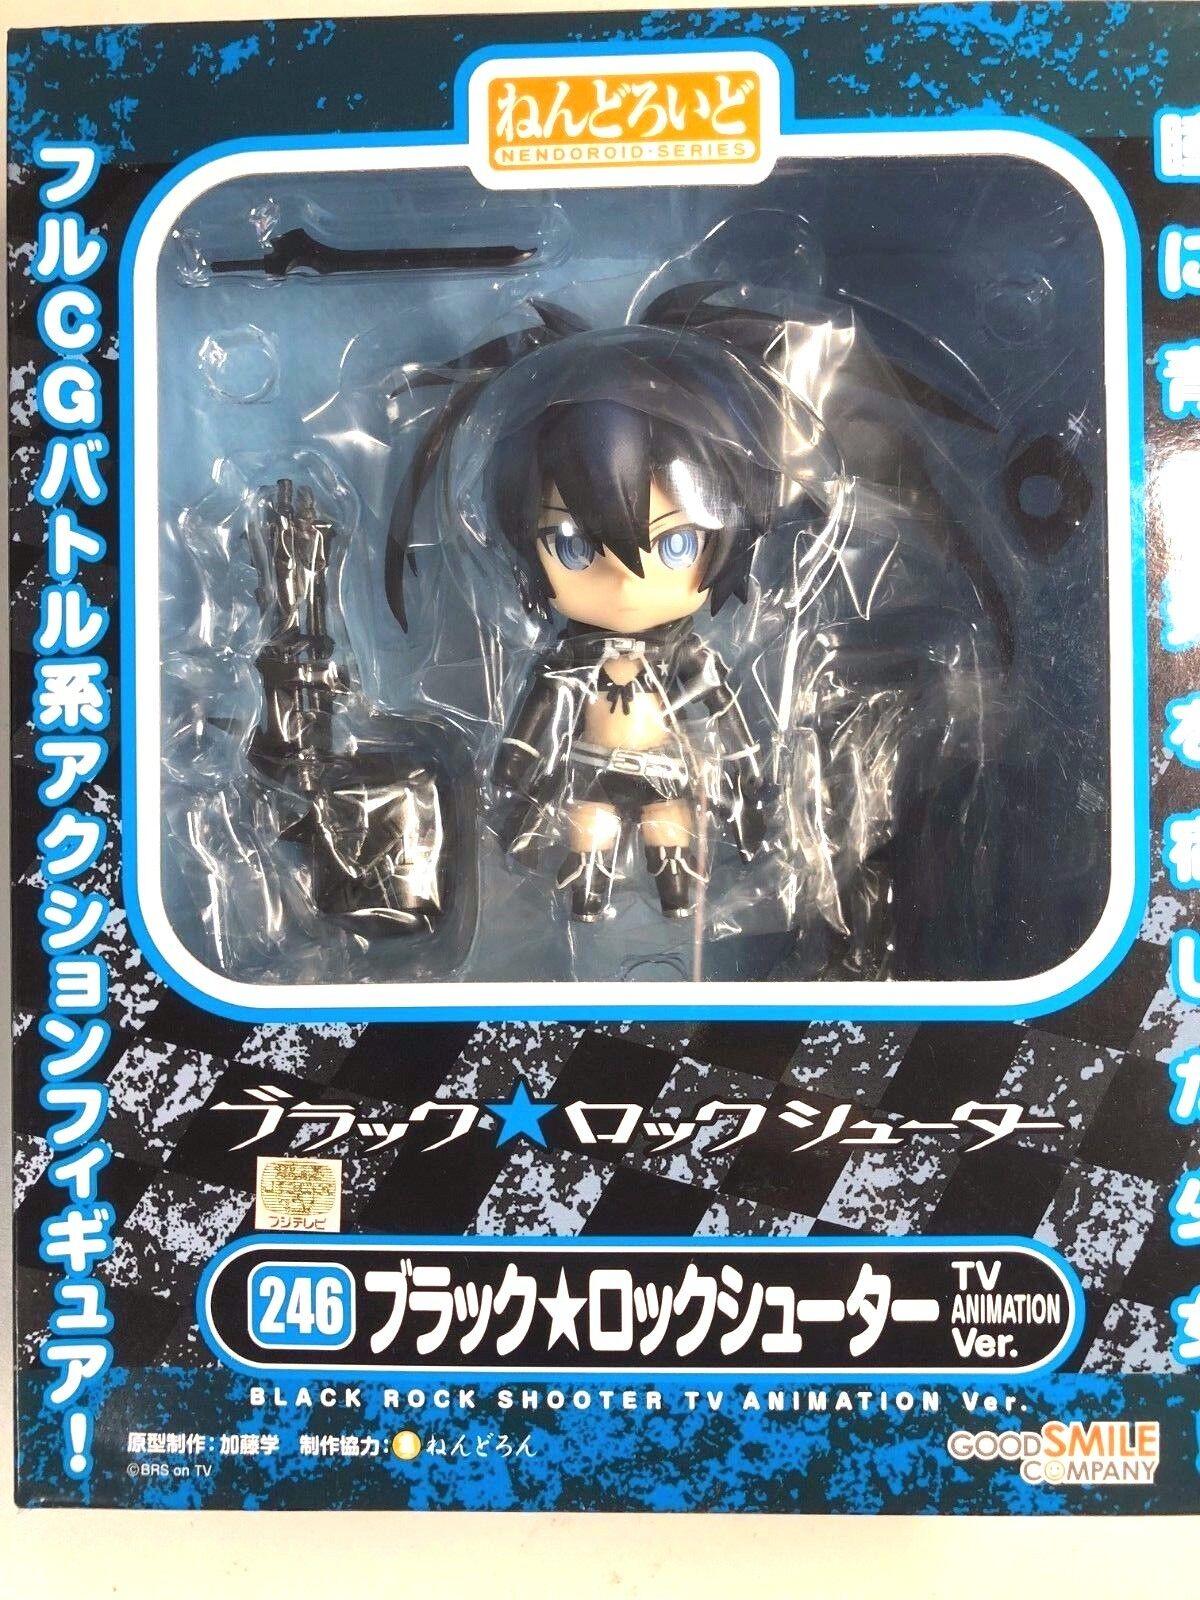 Nendoroid Black Rock Shooter TV ANIMATION Version ABS/&PVC Painted action Figure